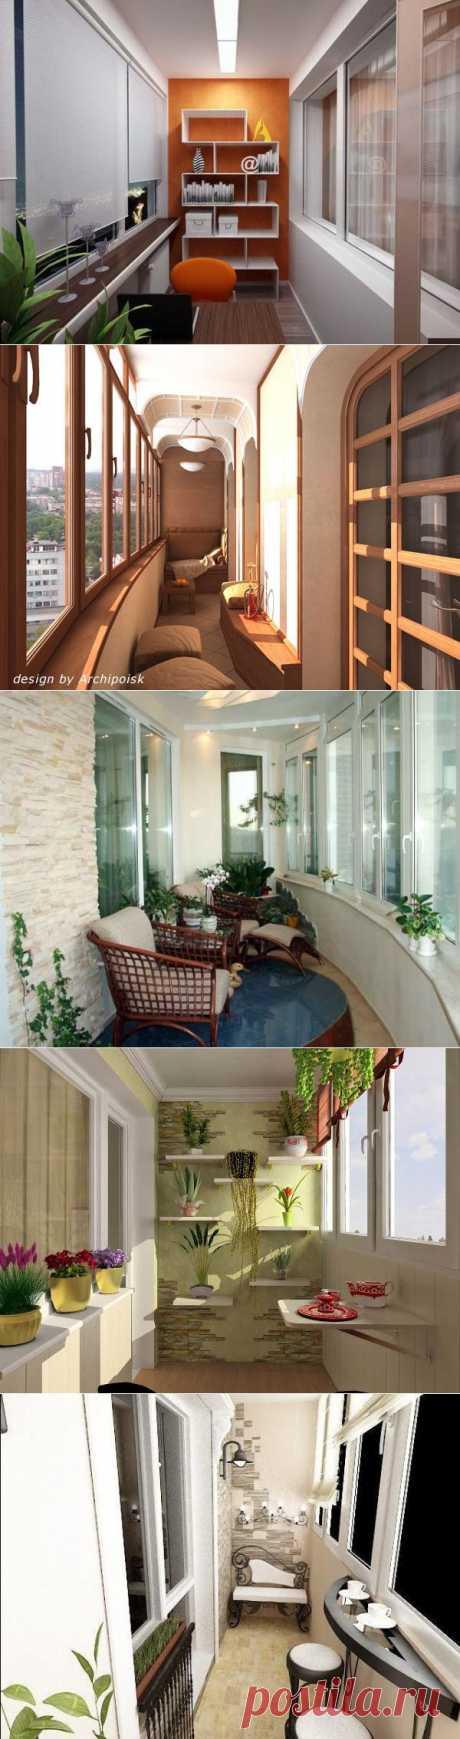 Создаём красоту на балконе   Домохозяйки